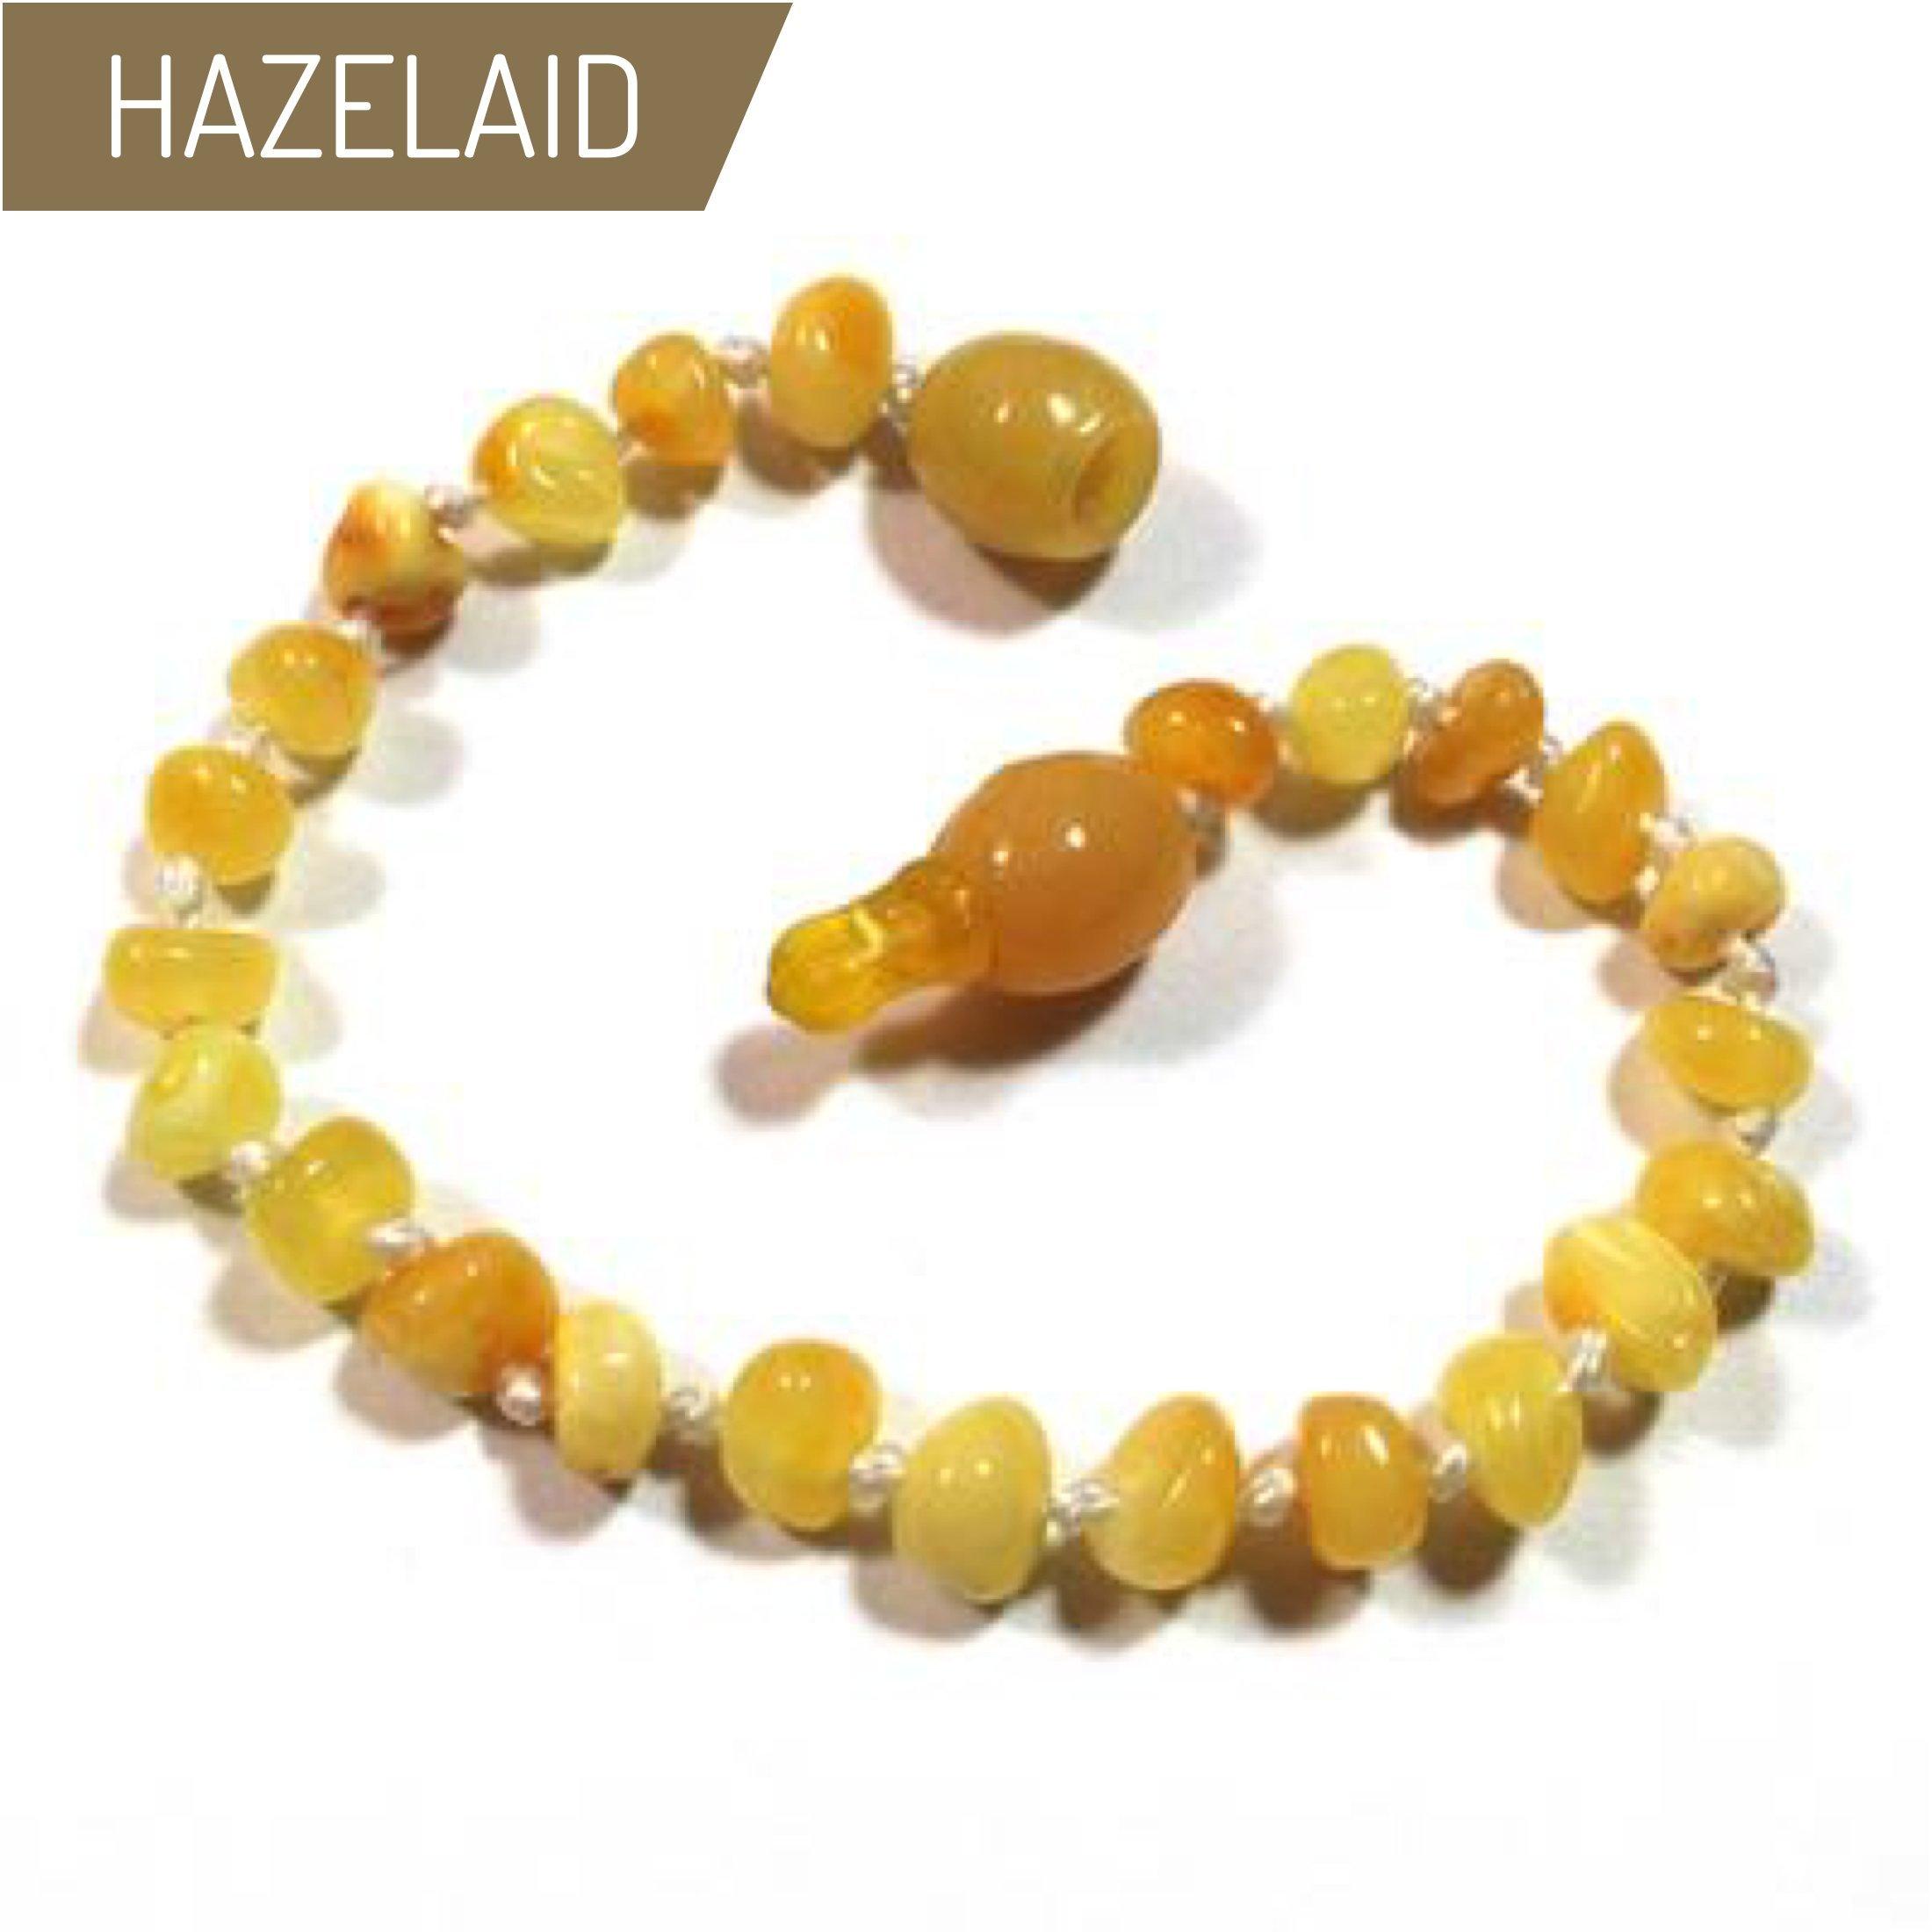 Hazelaid (TM) 5.5'' Pop-Clasp Baltic Amber Milk & Butter Bracelet